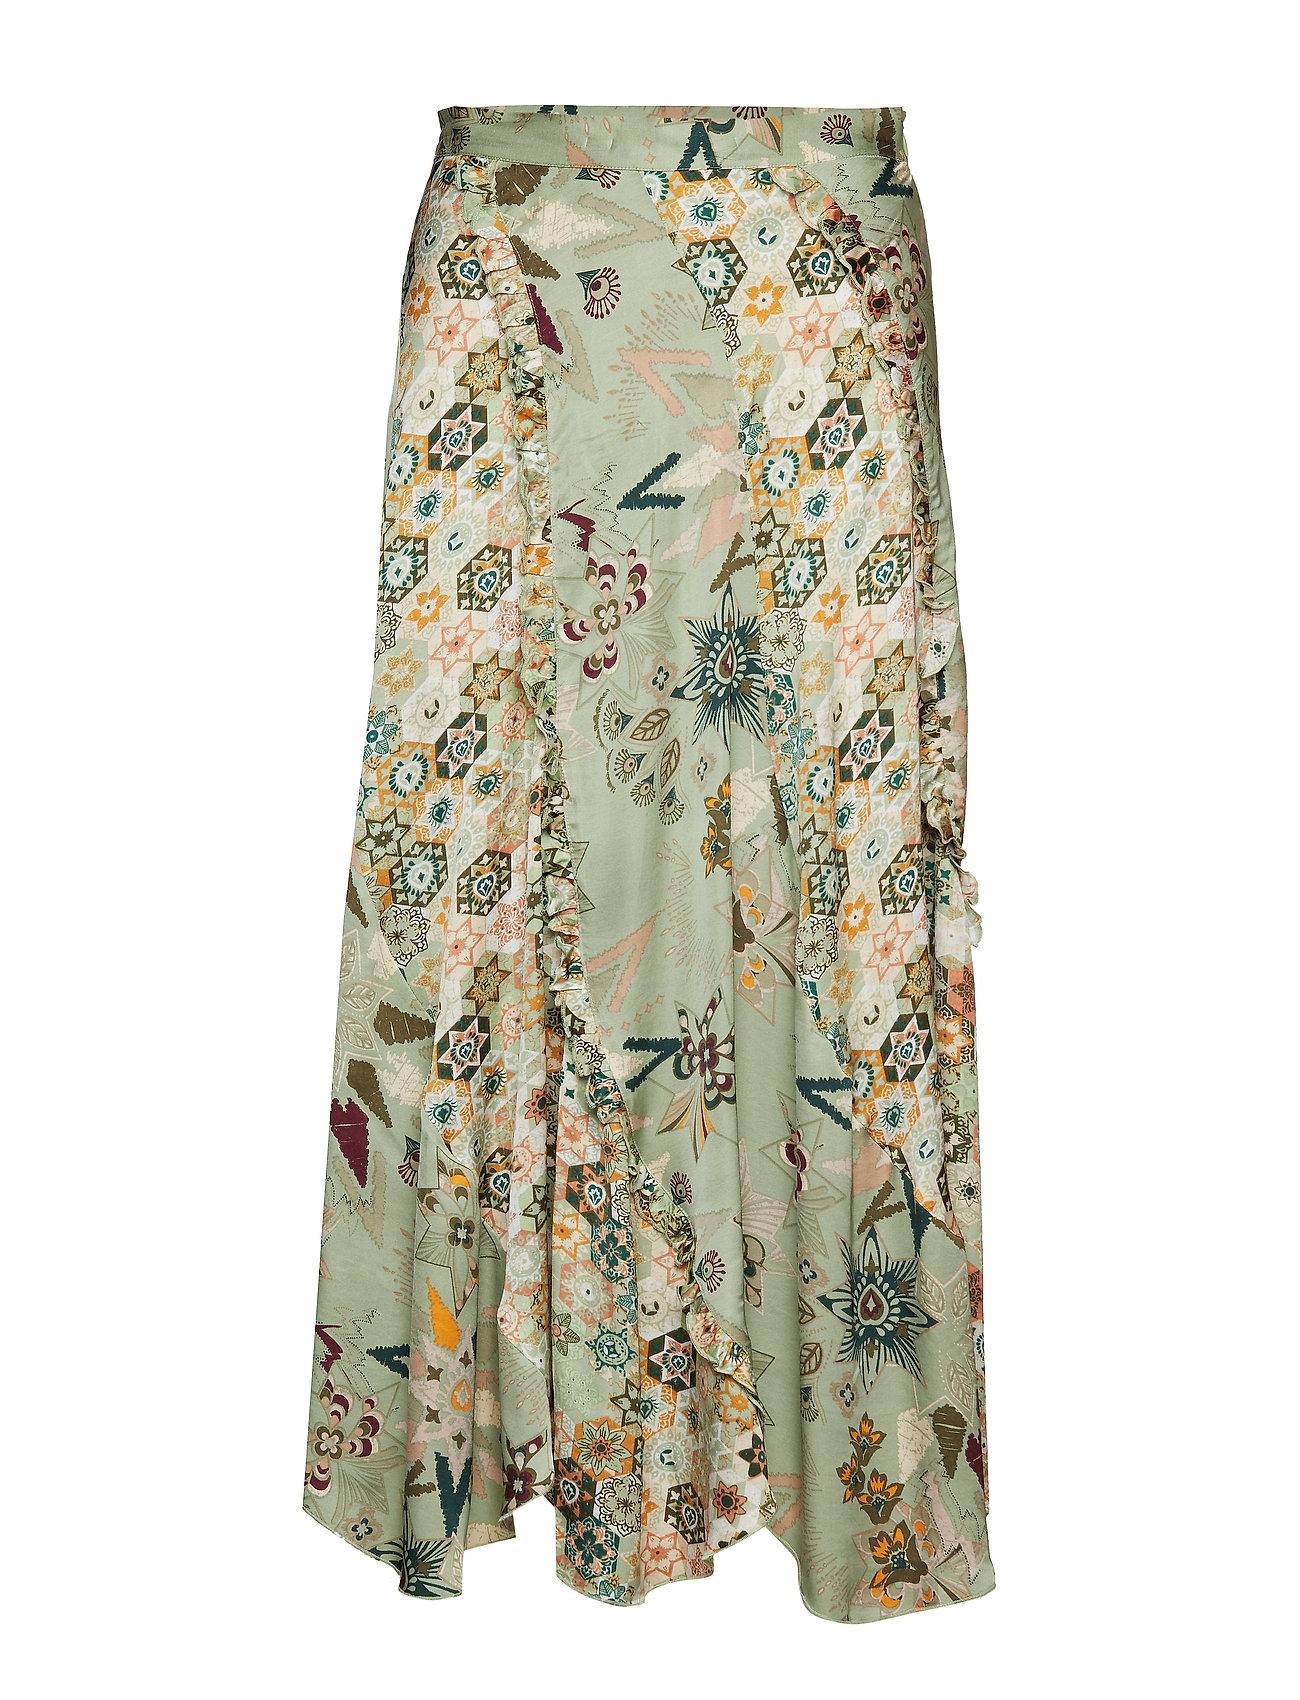 ODD MOLLY molly-hooked skirt - LICHEN GREEN